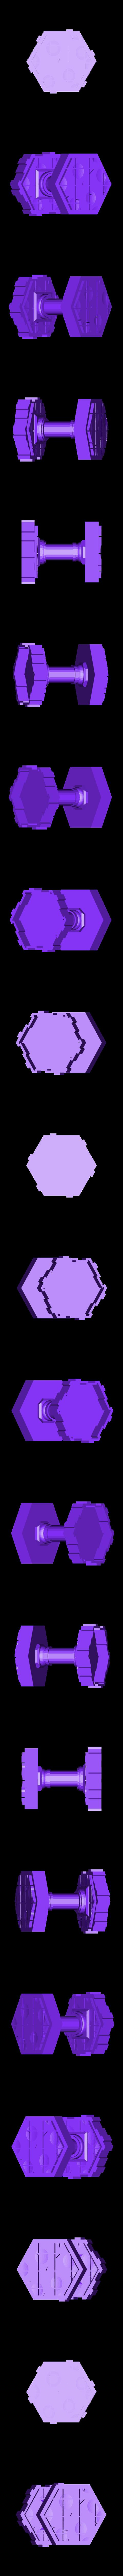 Hex_Pillar_with_Top_Together.stl Download free STL file Locking Hex Stone Pillars • 3D printable design, mrhers2